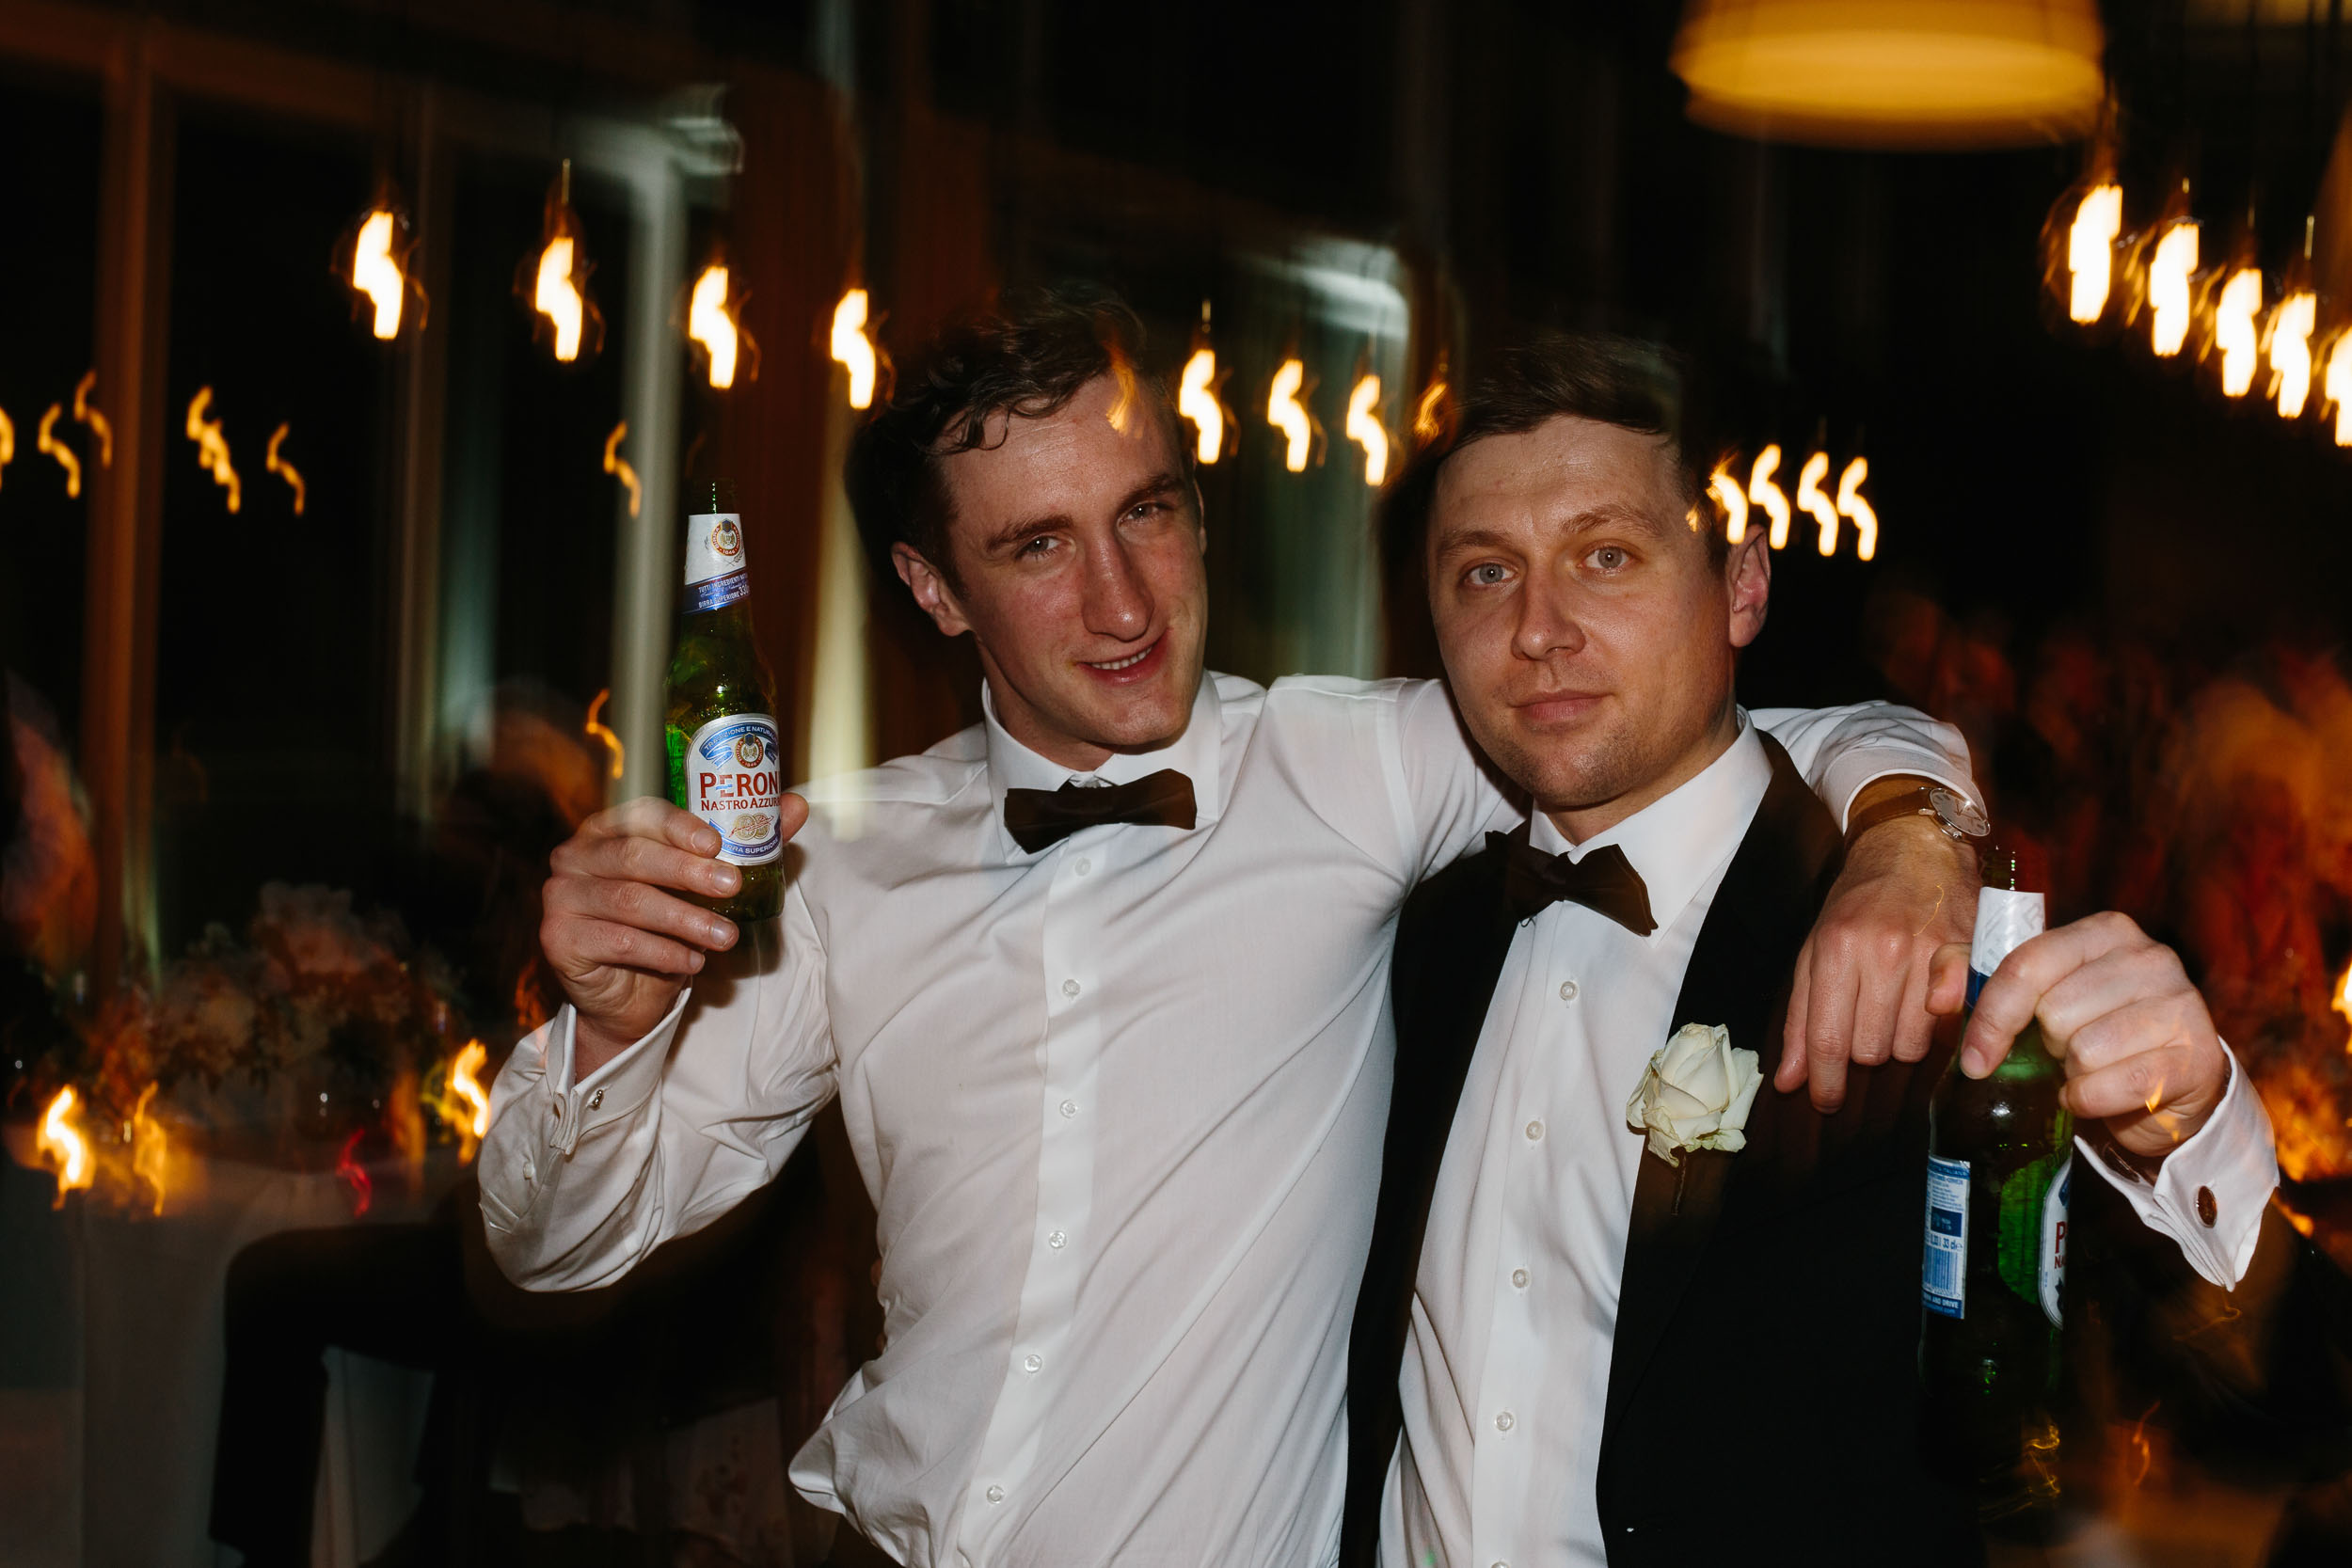 Kas-Richards-Wedding-Photographer-Melbourne-City-Wedding-Alto-Event-Space-Jane-Hill-Bridal-Gown-74.jpg